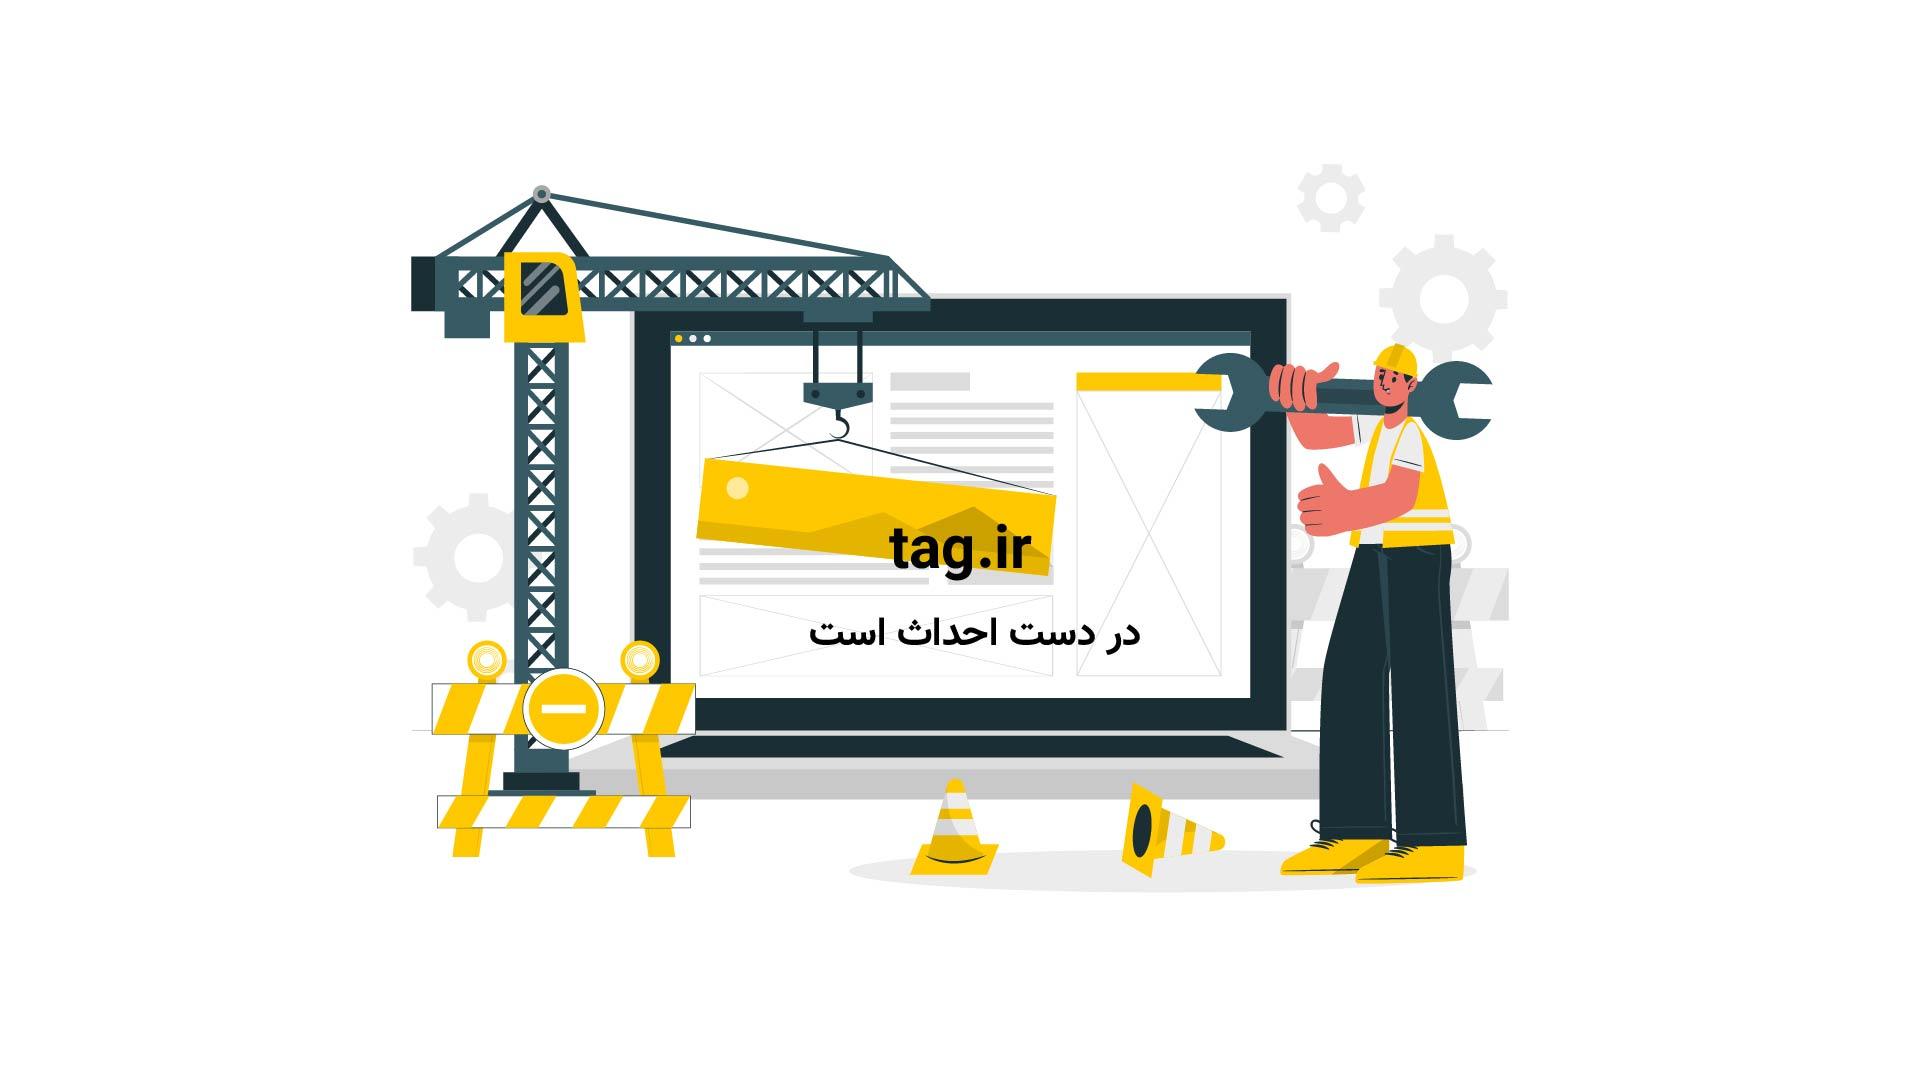 آبشار ویکتوریا | تگ